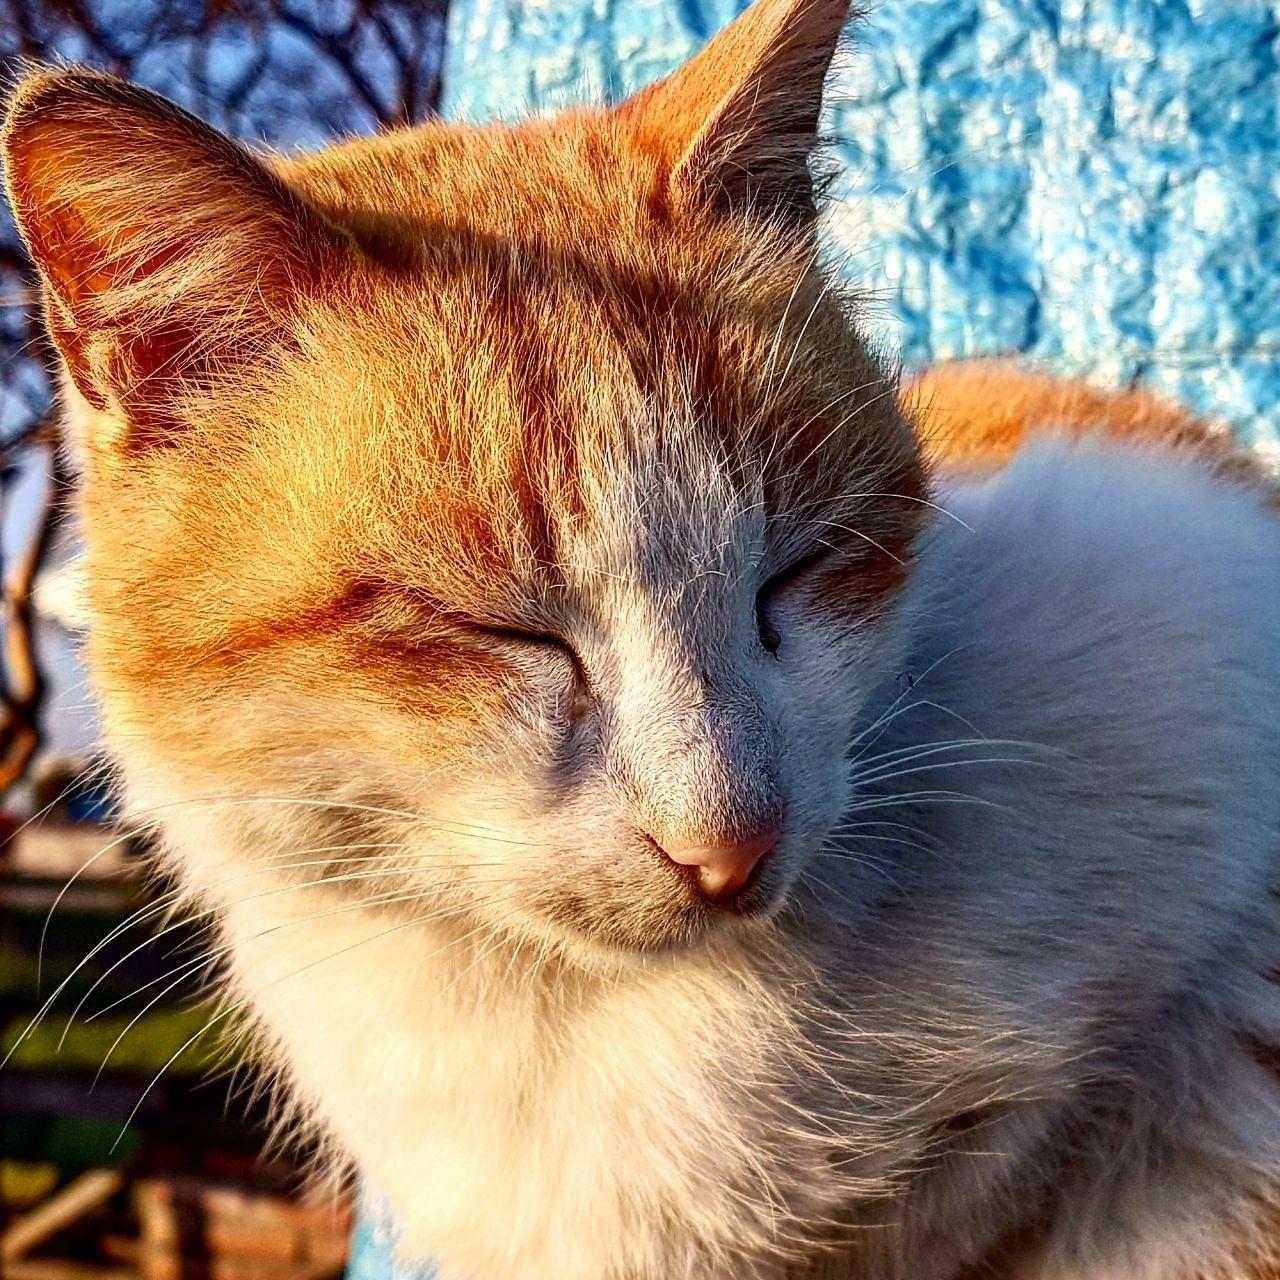 Cat by taherikambiz